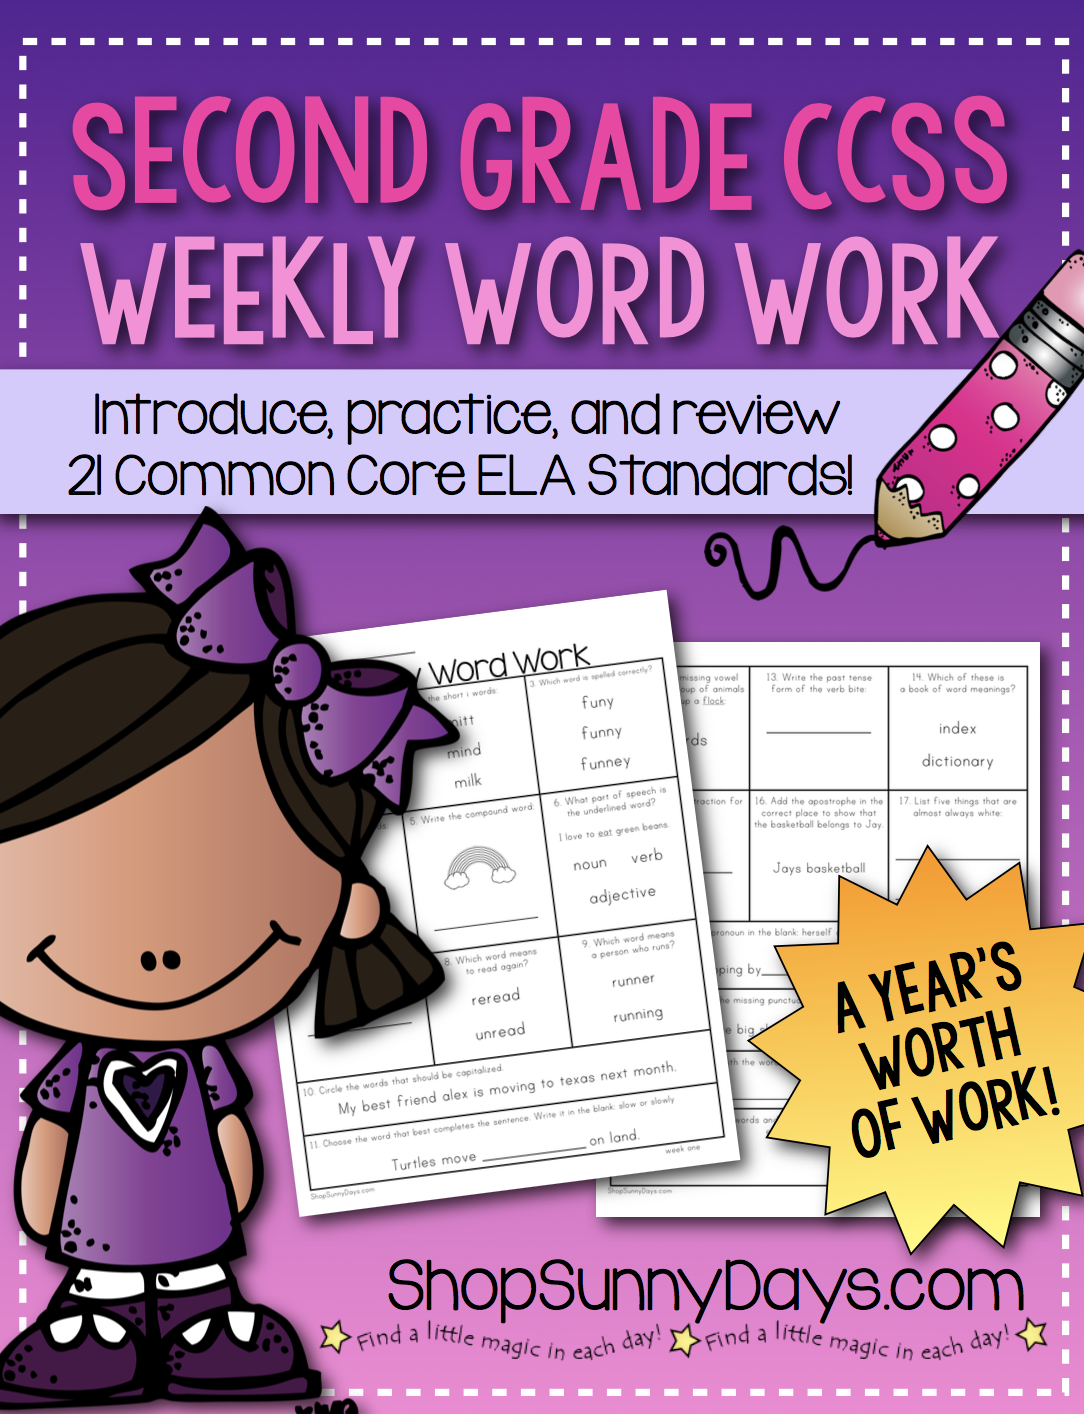 Second Grade Weekly Word Work